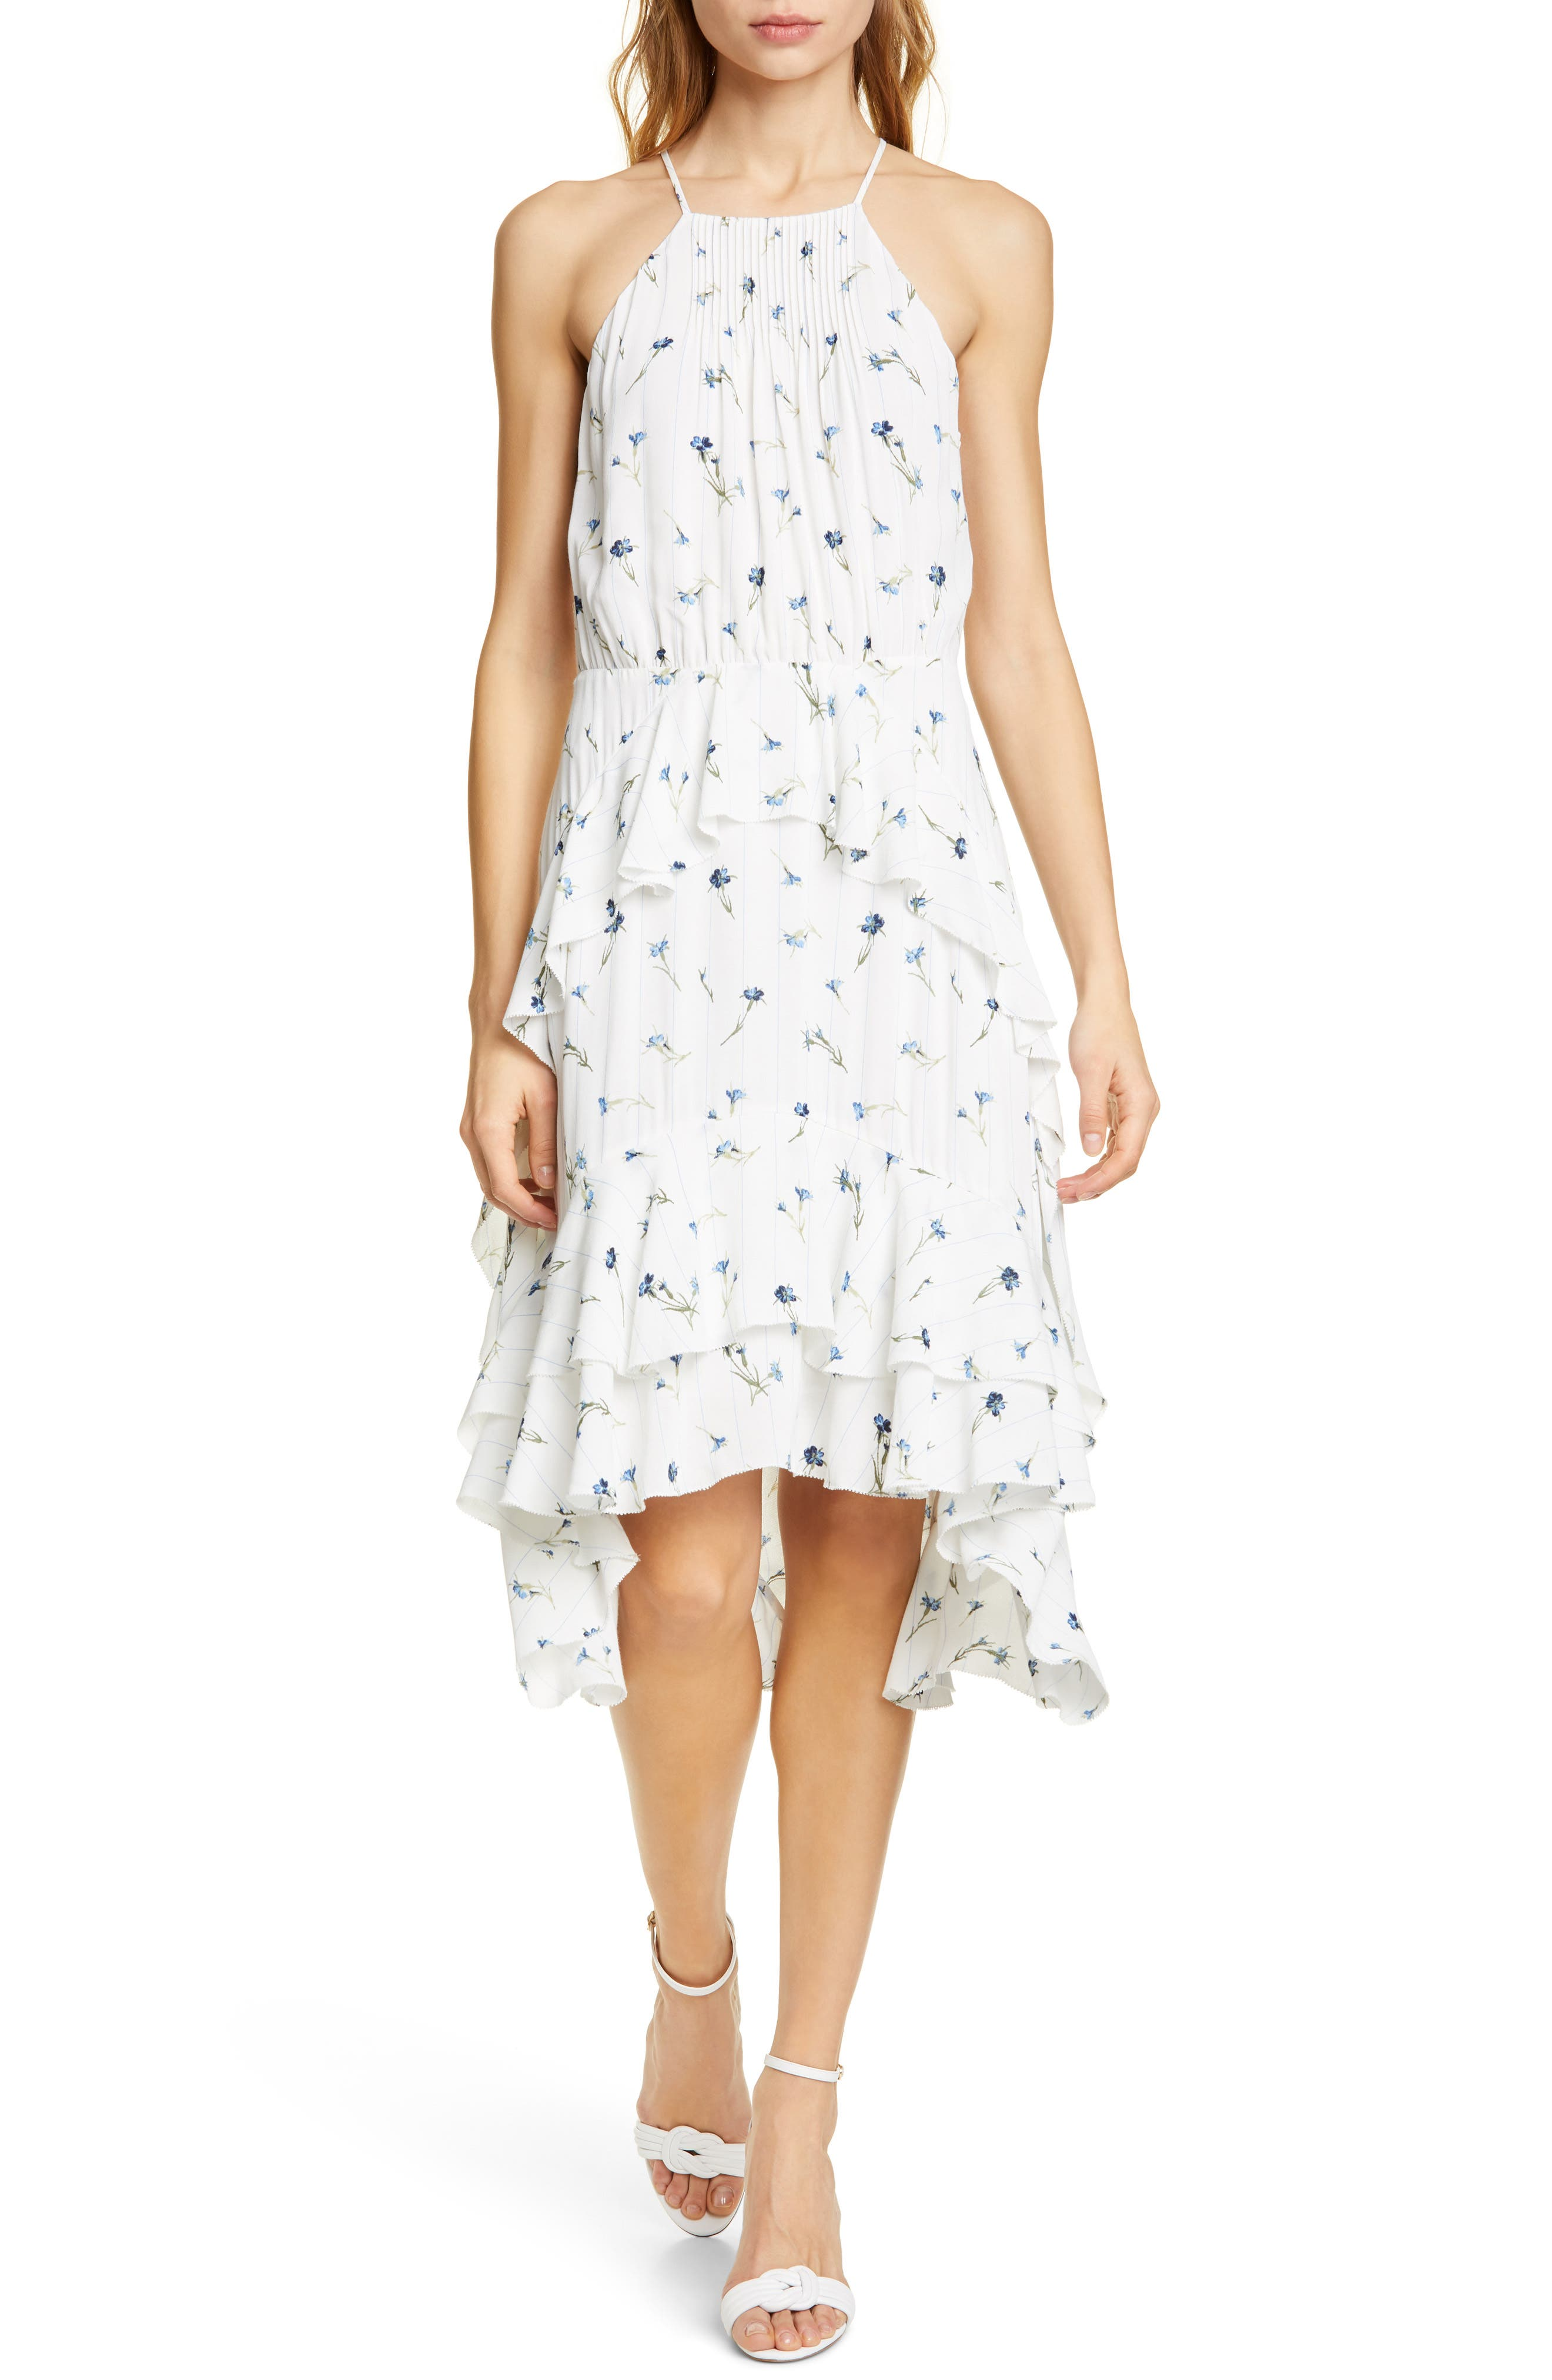 Joie Lamberta Sleeveless High/low Dress, Ivory